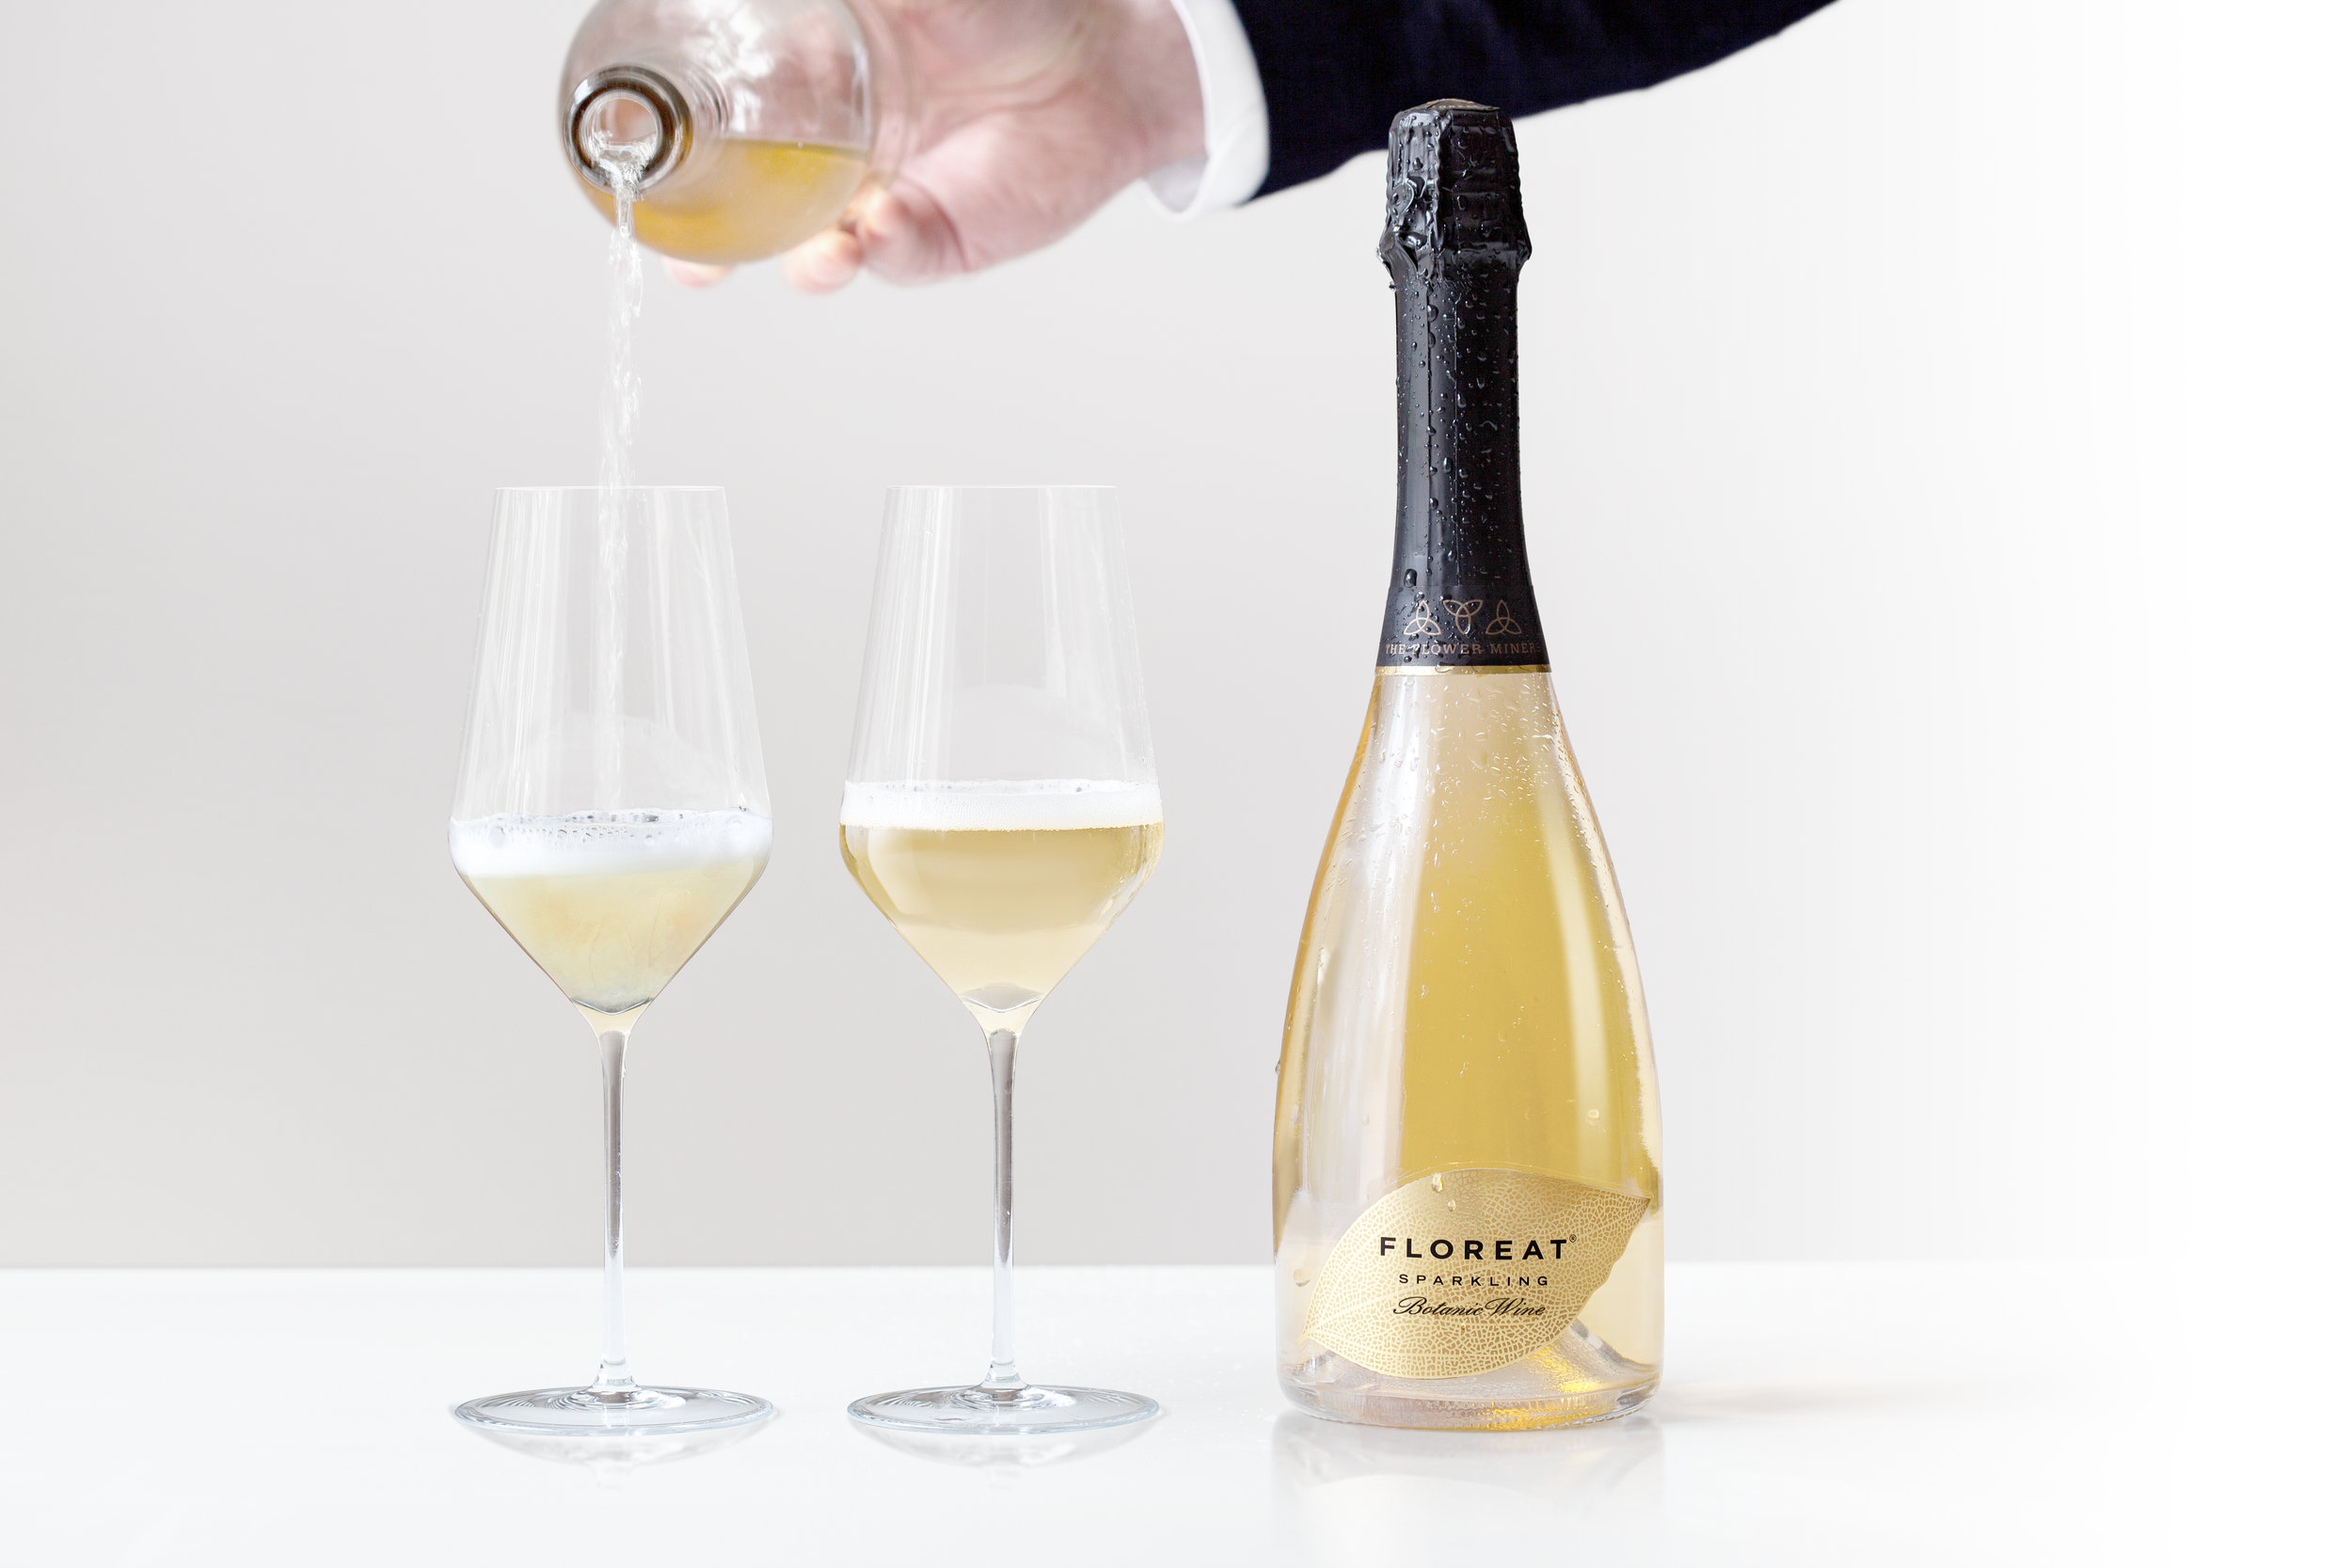 Floreat botanical sparkling wine